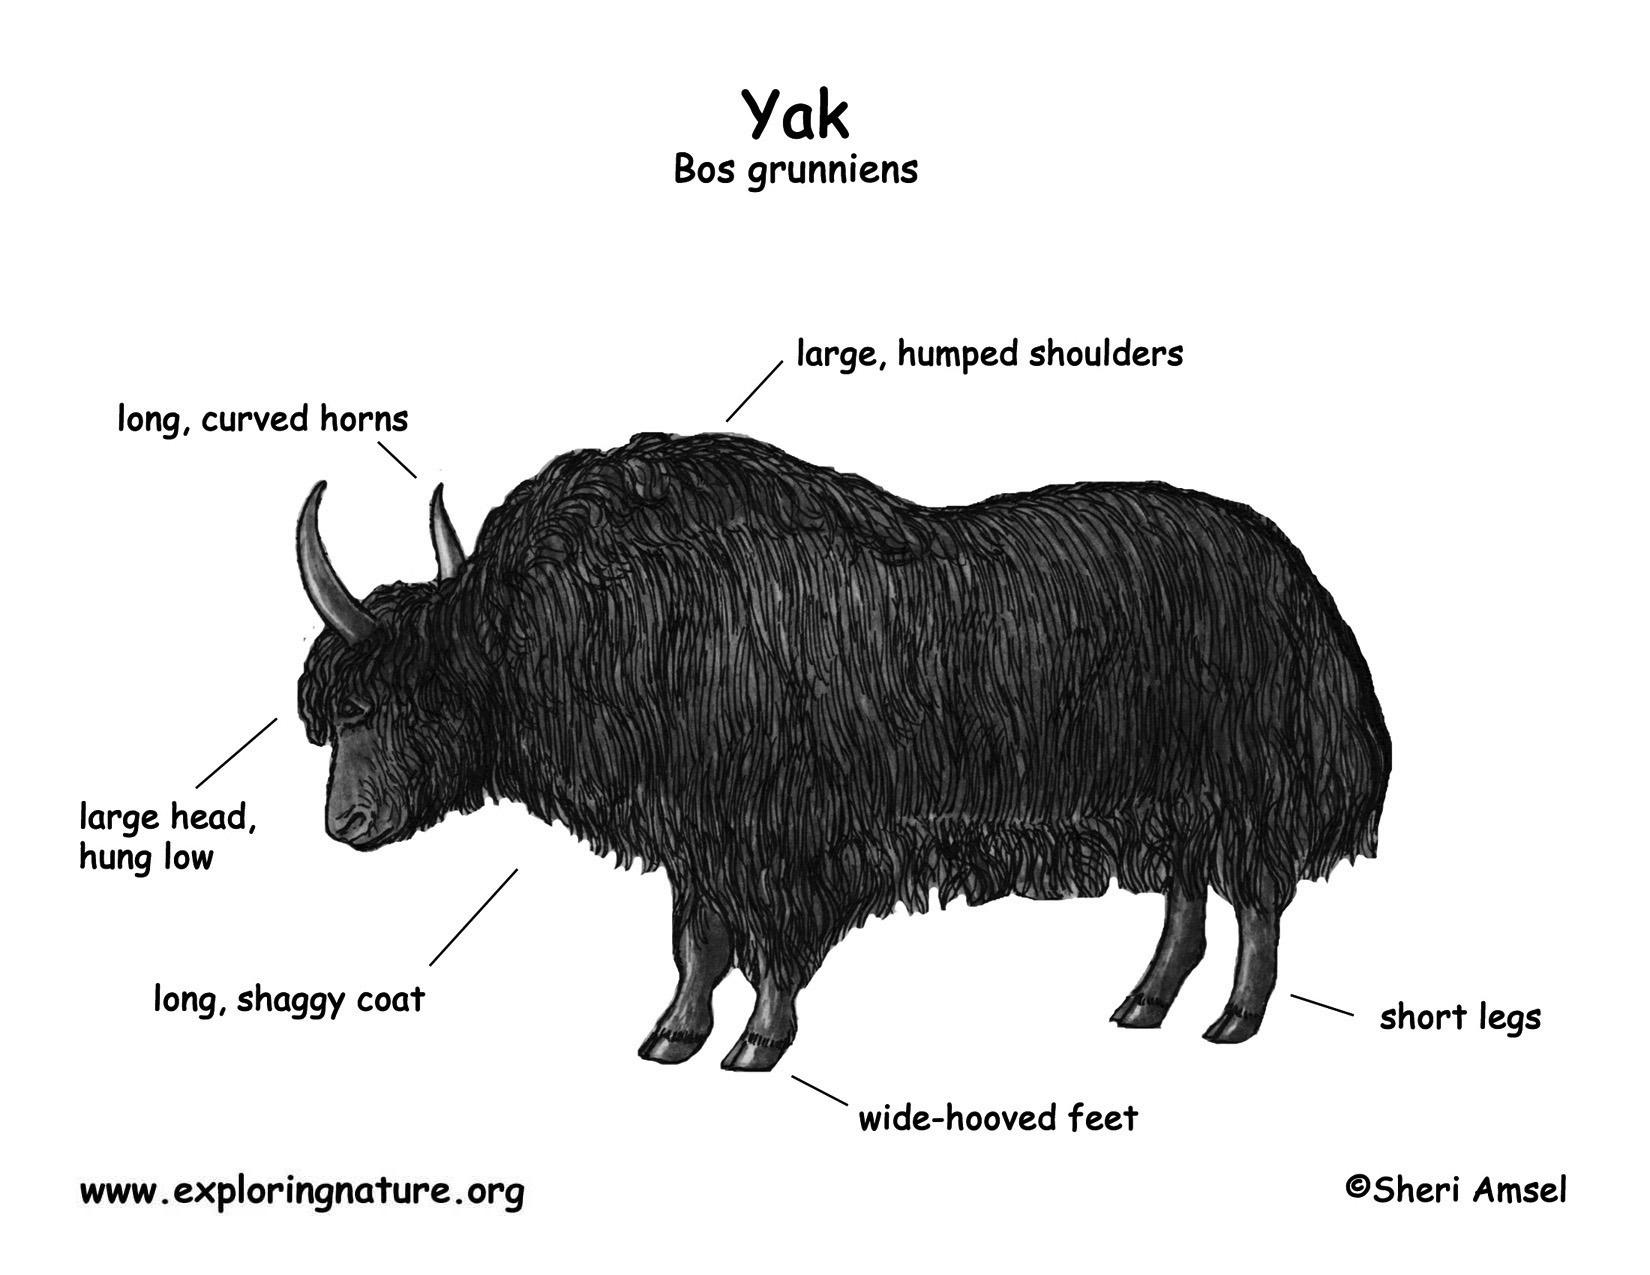 Coloring pages yak - Download Hi Res Color Diagram Yak